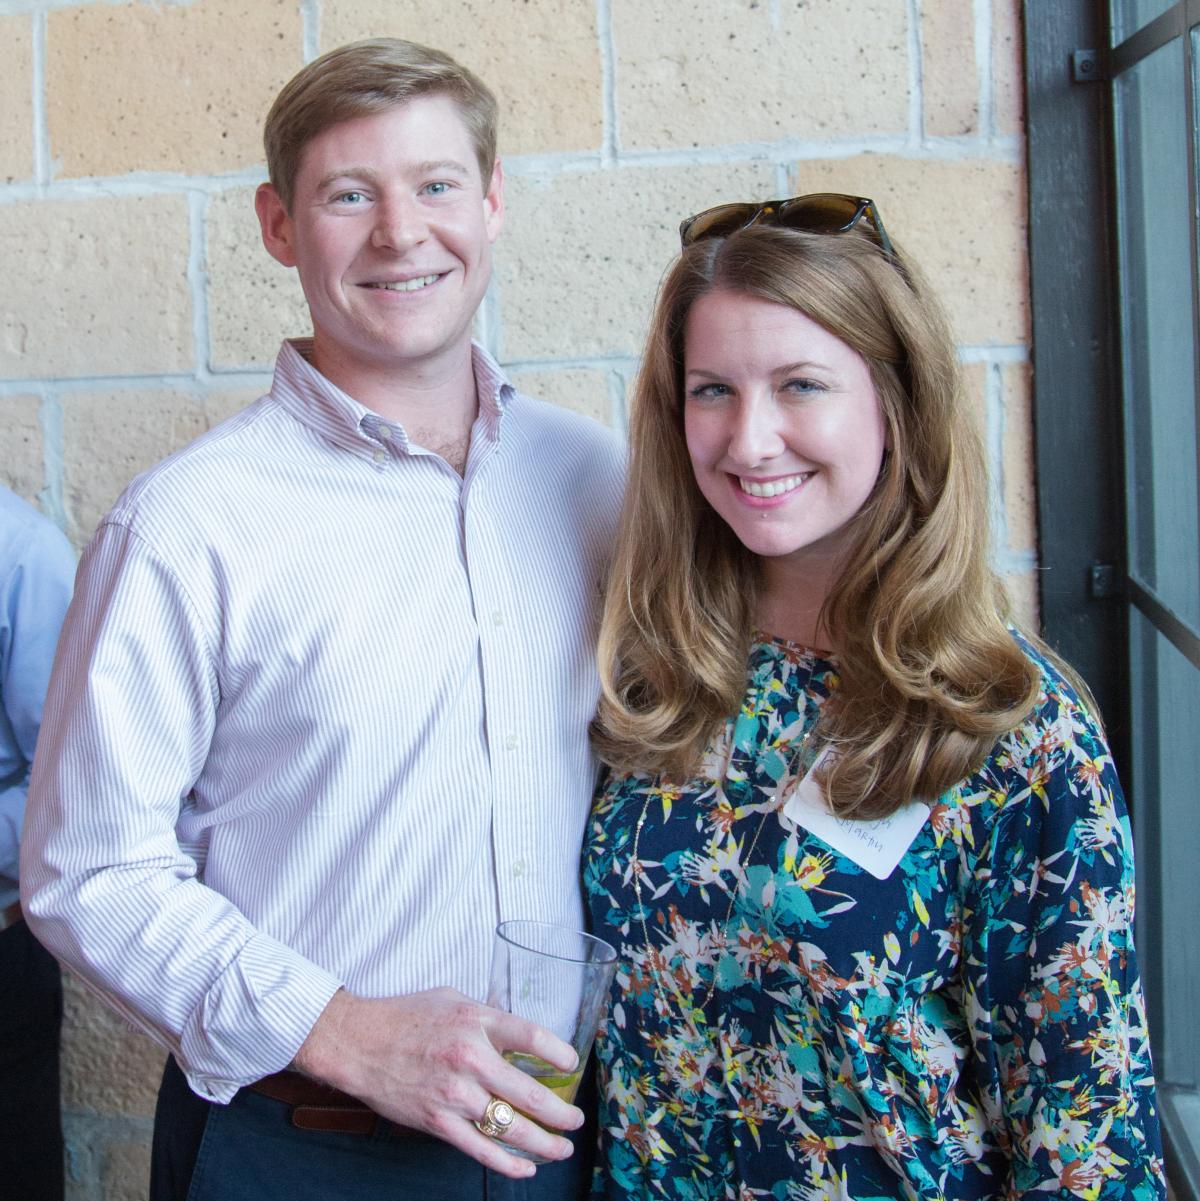 Houston, Casa de Esperanza YP Happy Hour, September 2015, John Vivrett and Jaclyn Martin